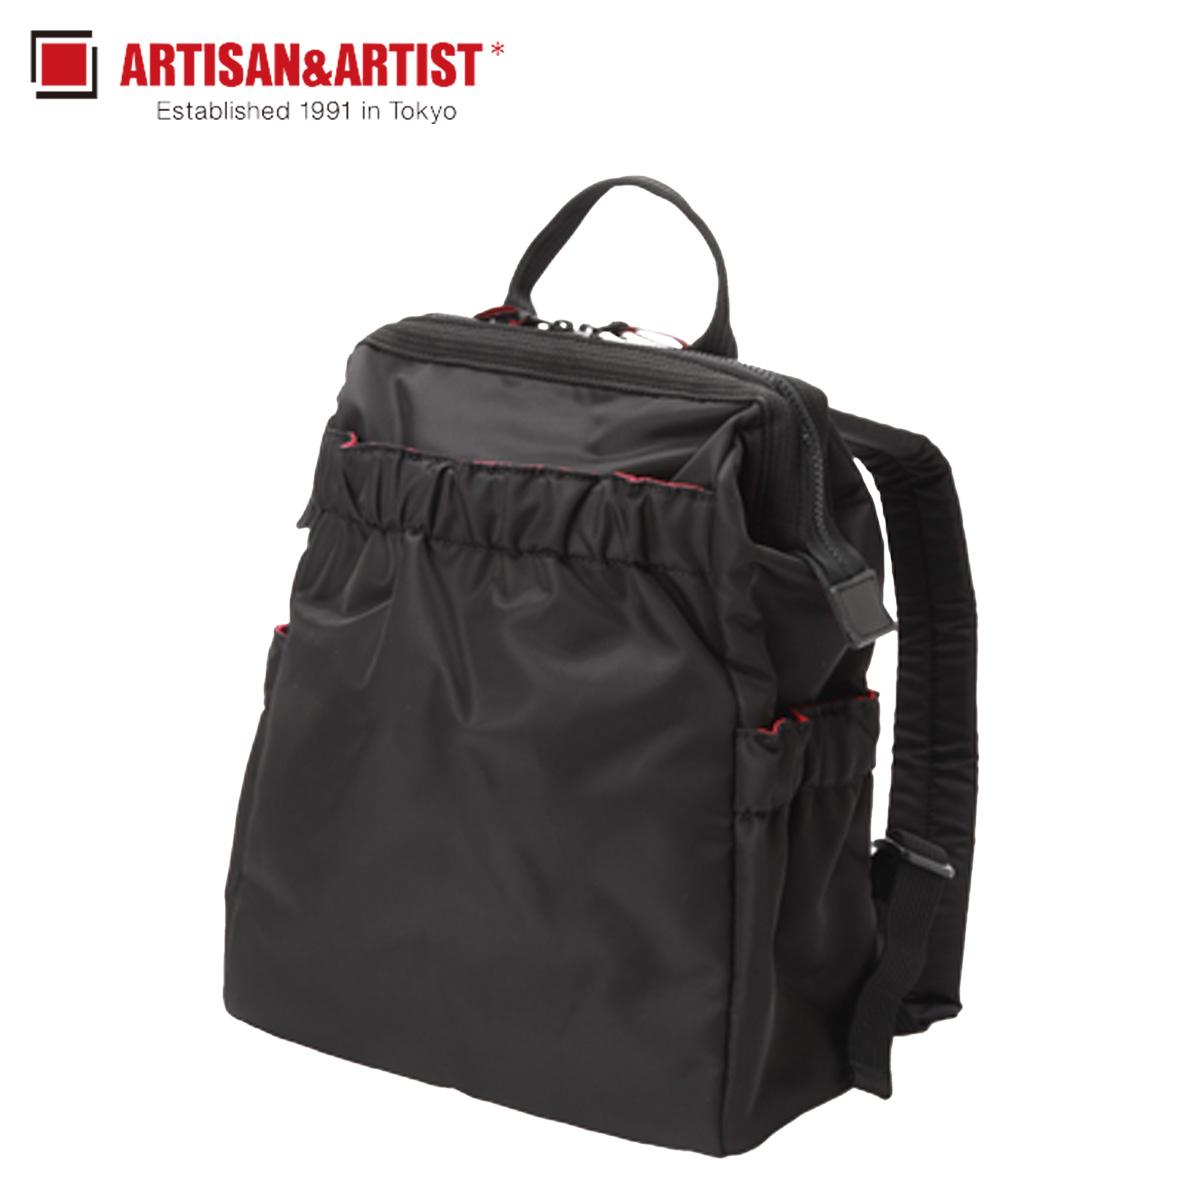 ARTISAN&ARTIST アルティザン&アーティスト リュック バッグ バックパック レディース CLASP STANDARD ブラック 黒 KG2-704